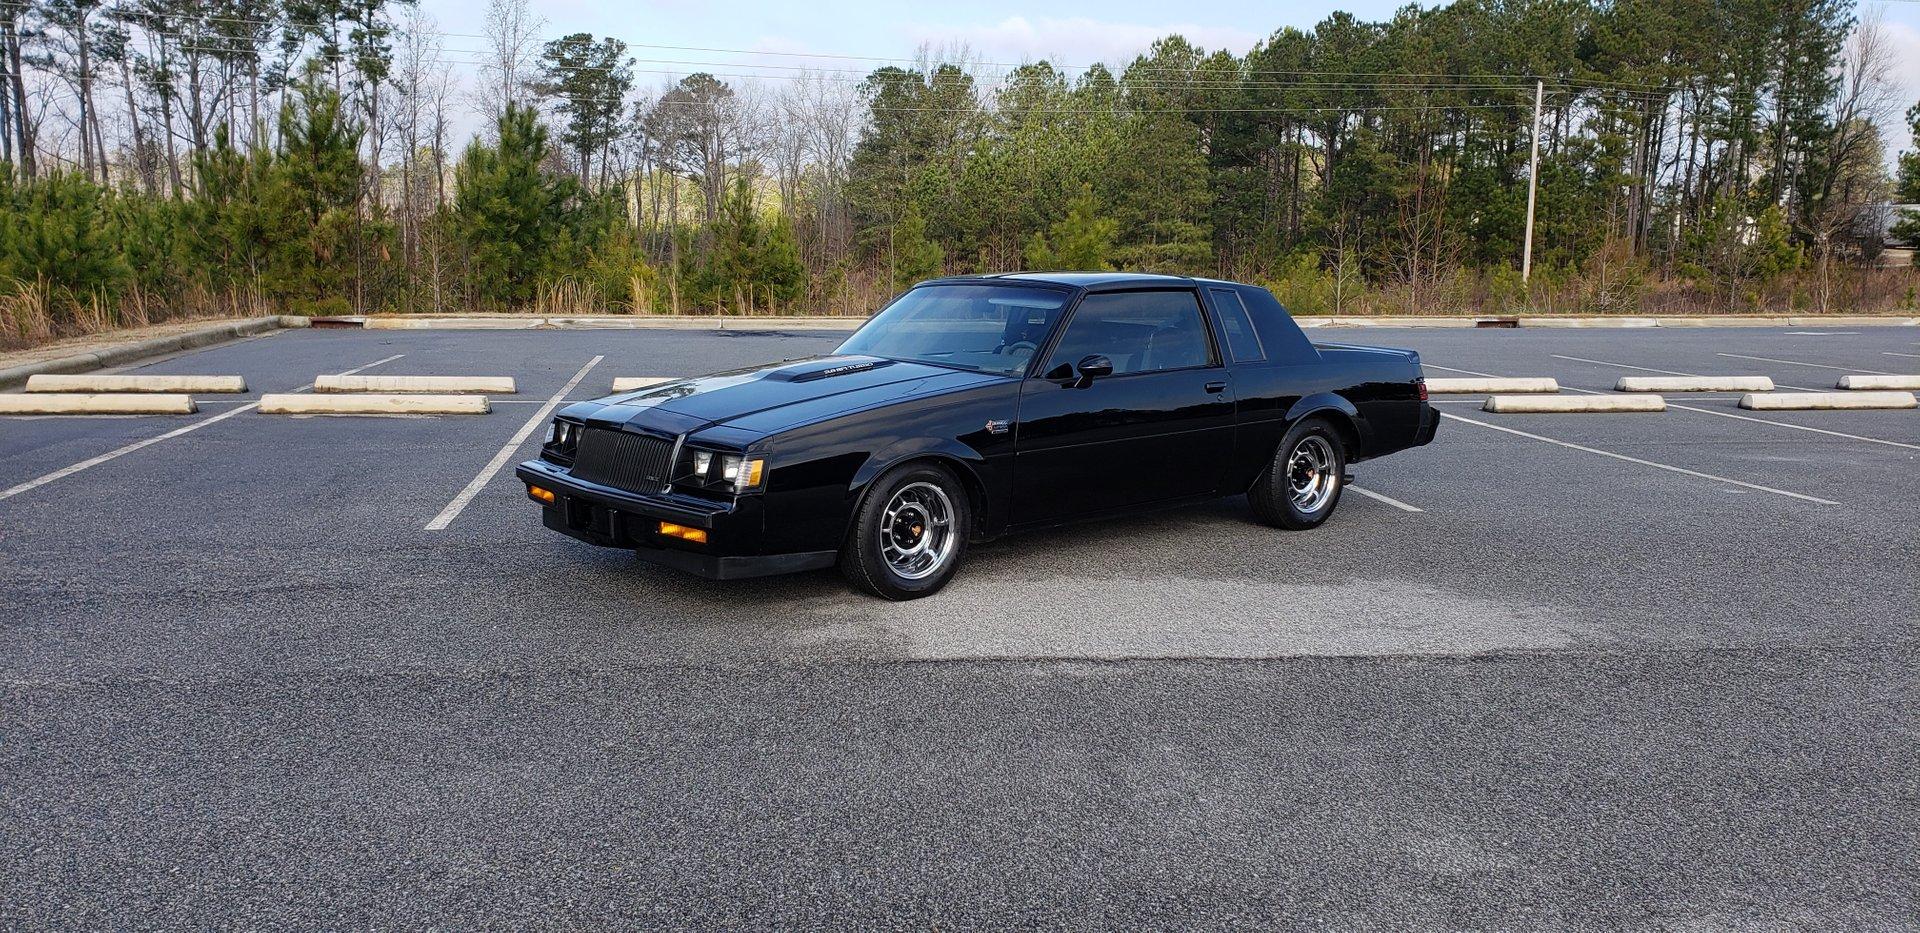 1987 Buick Grand National | GAA Classic Cars